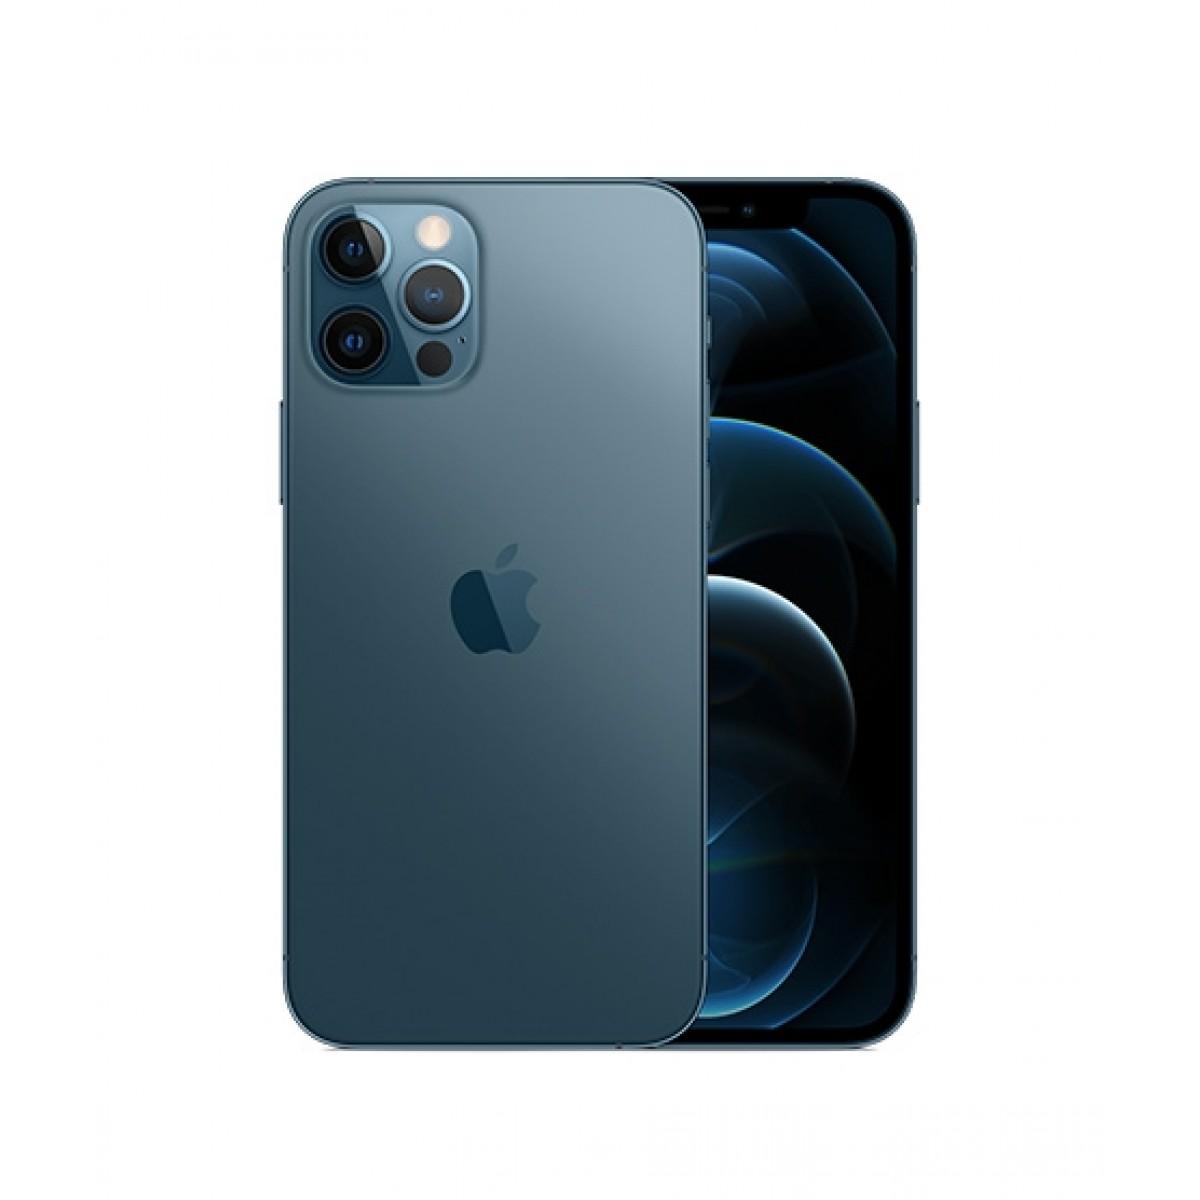 Apple iPhone 12 Pro 256GB Dual Sim